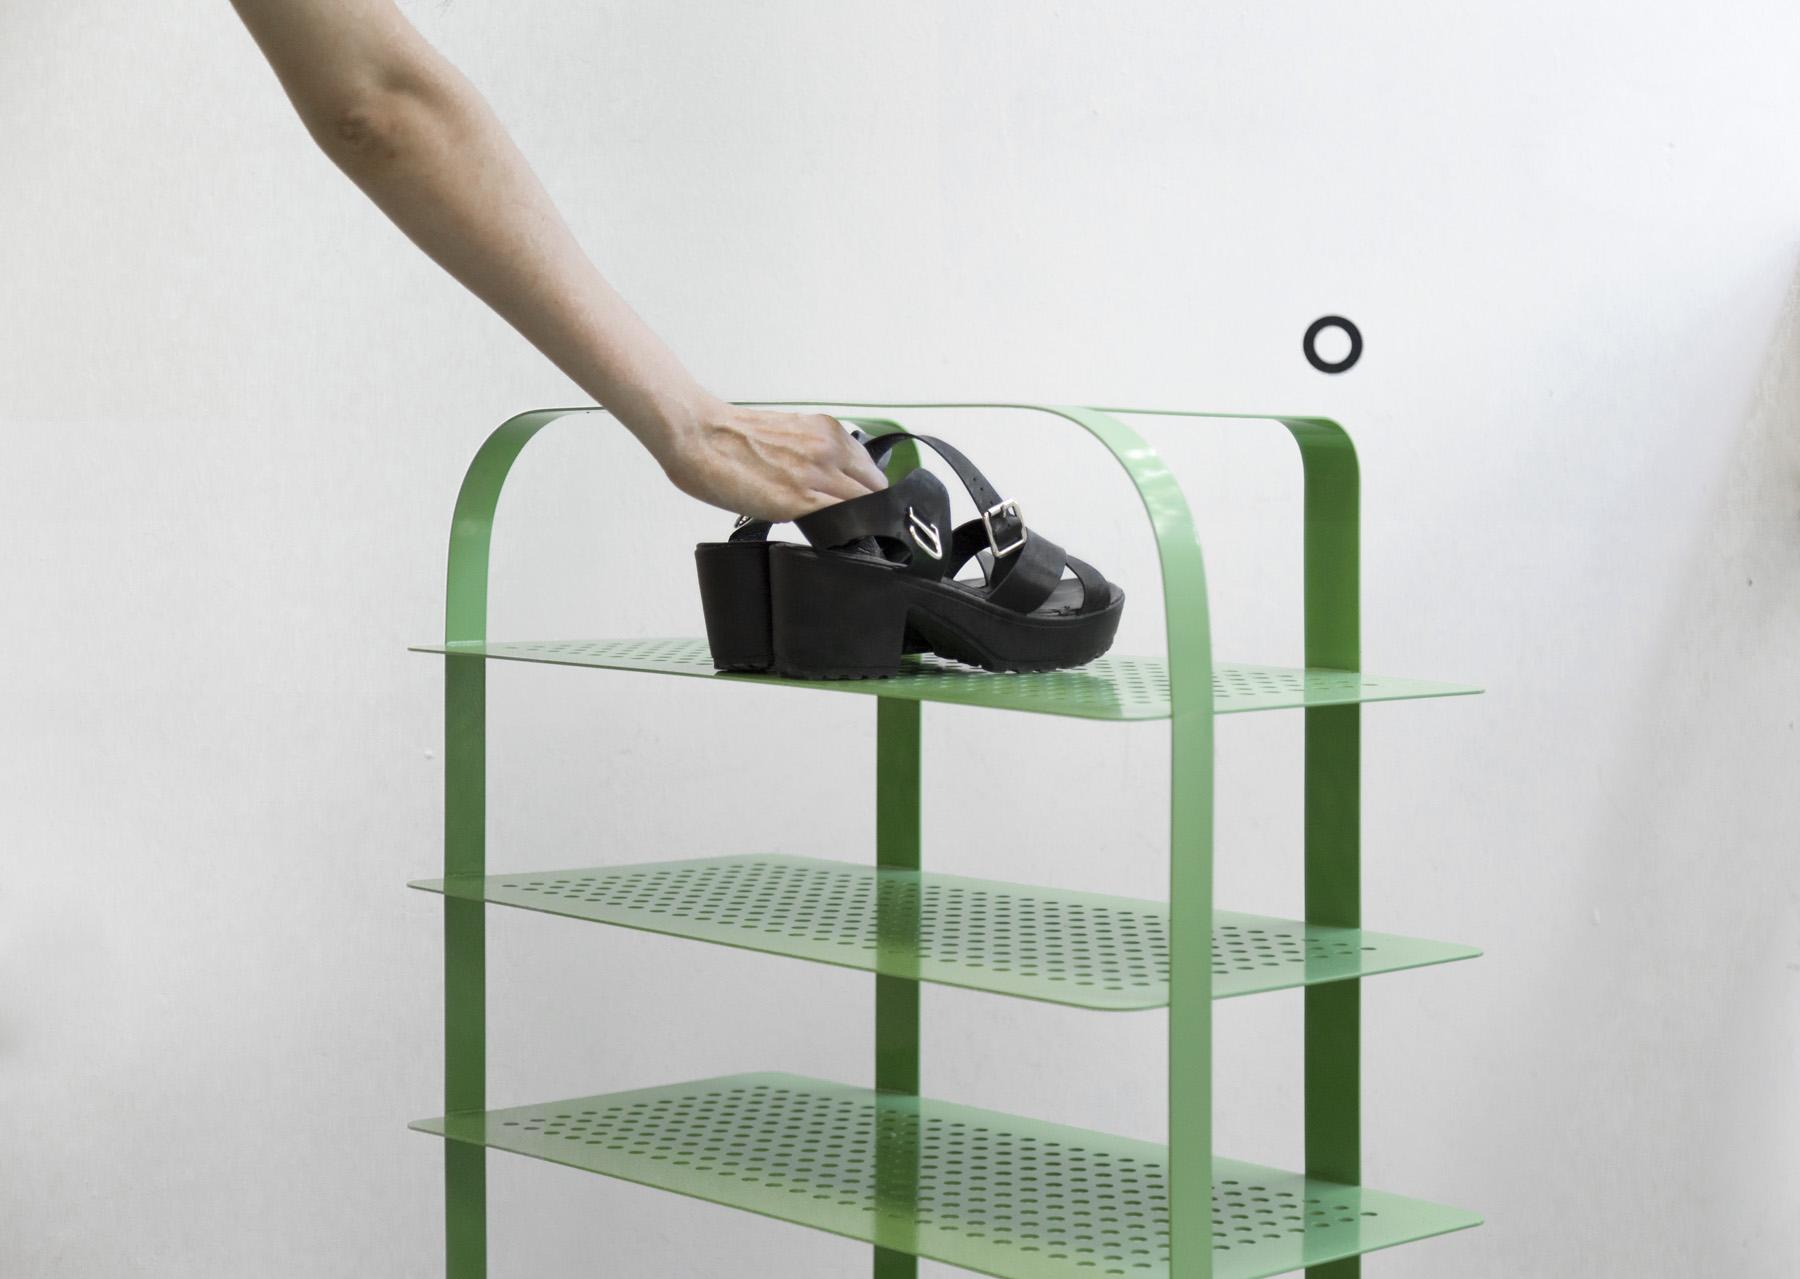 fliq-prod2 PATH Shoe rack lores.JPG